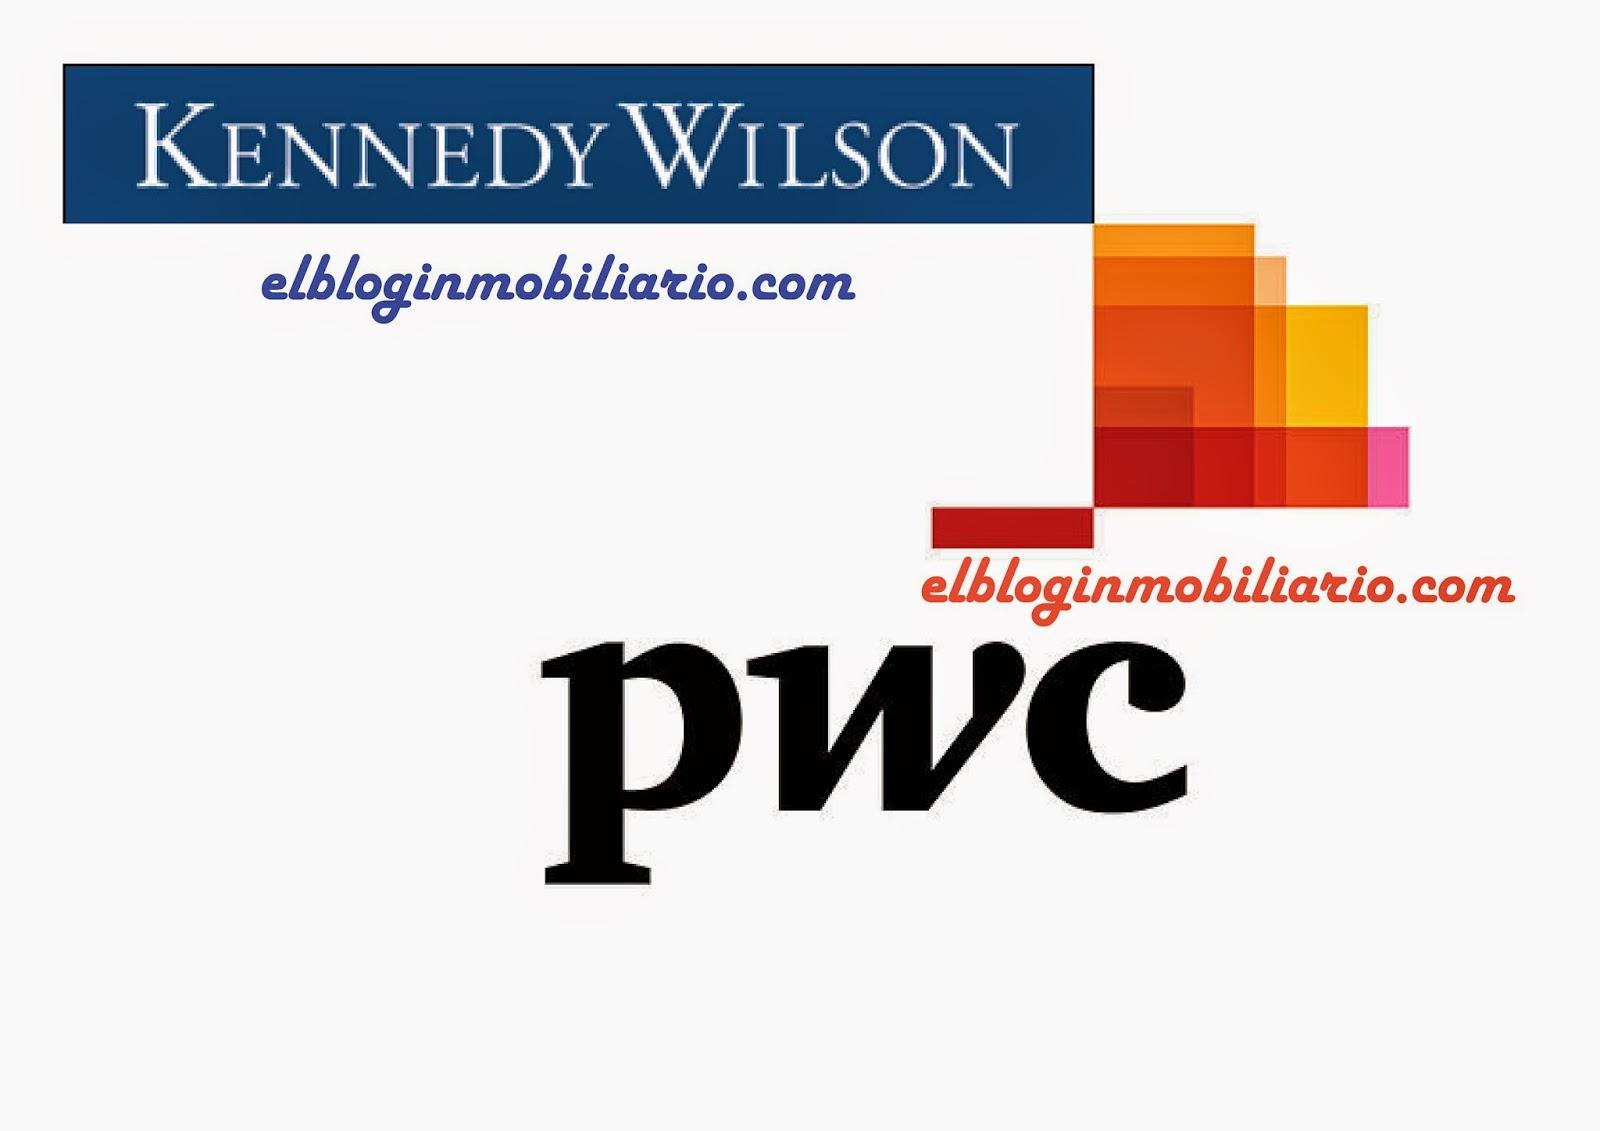 kennedy wilson pwc elbloginmobiliario.com